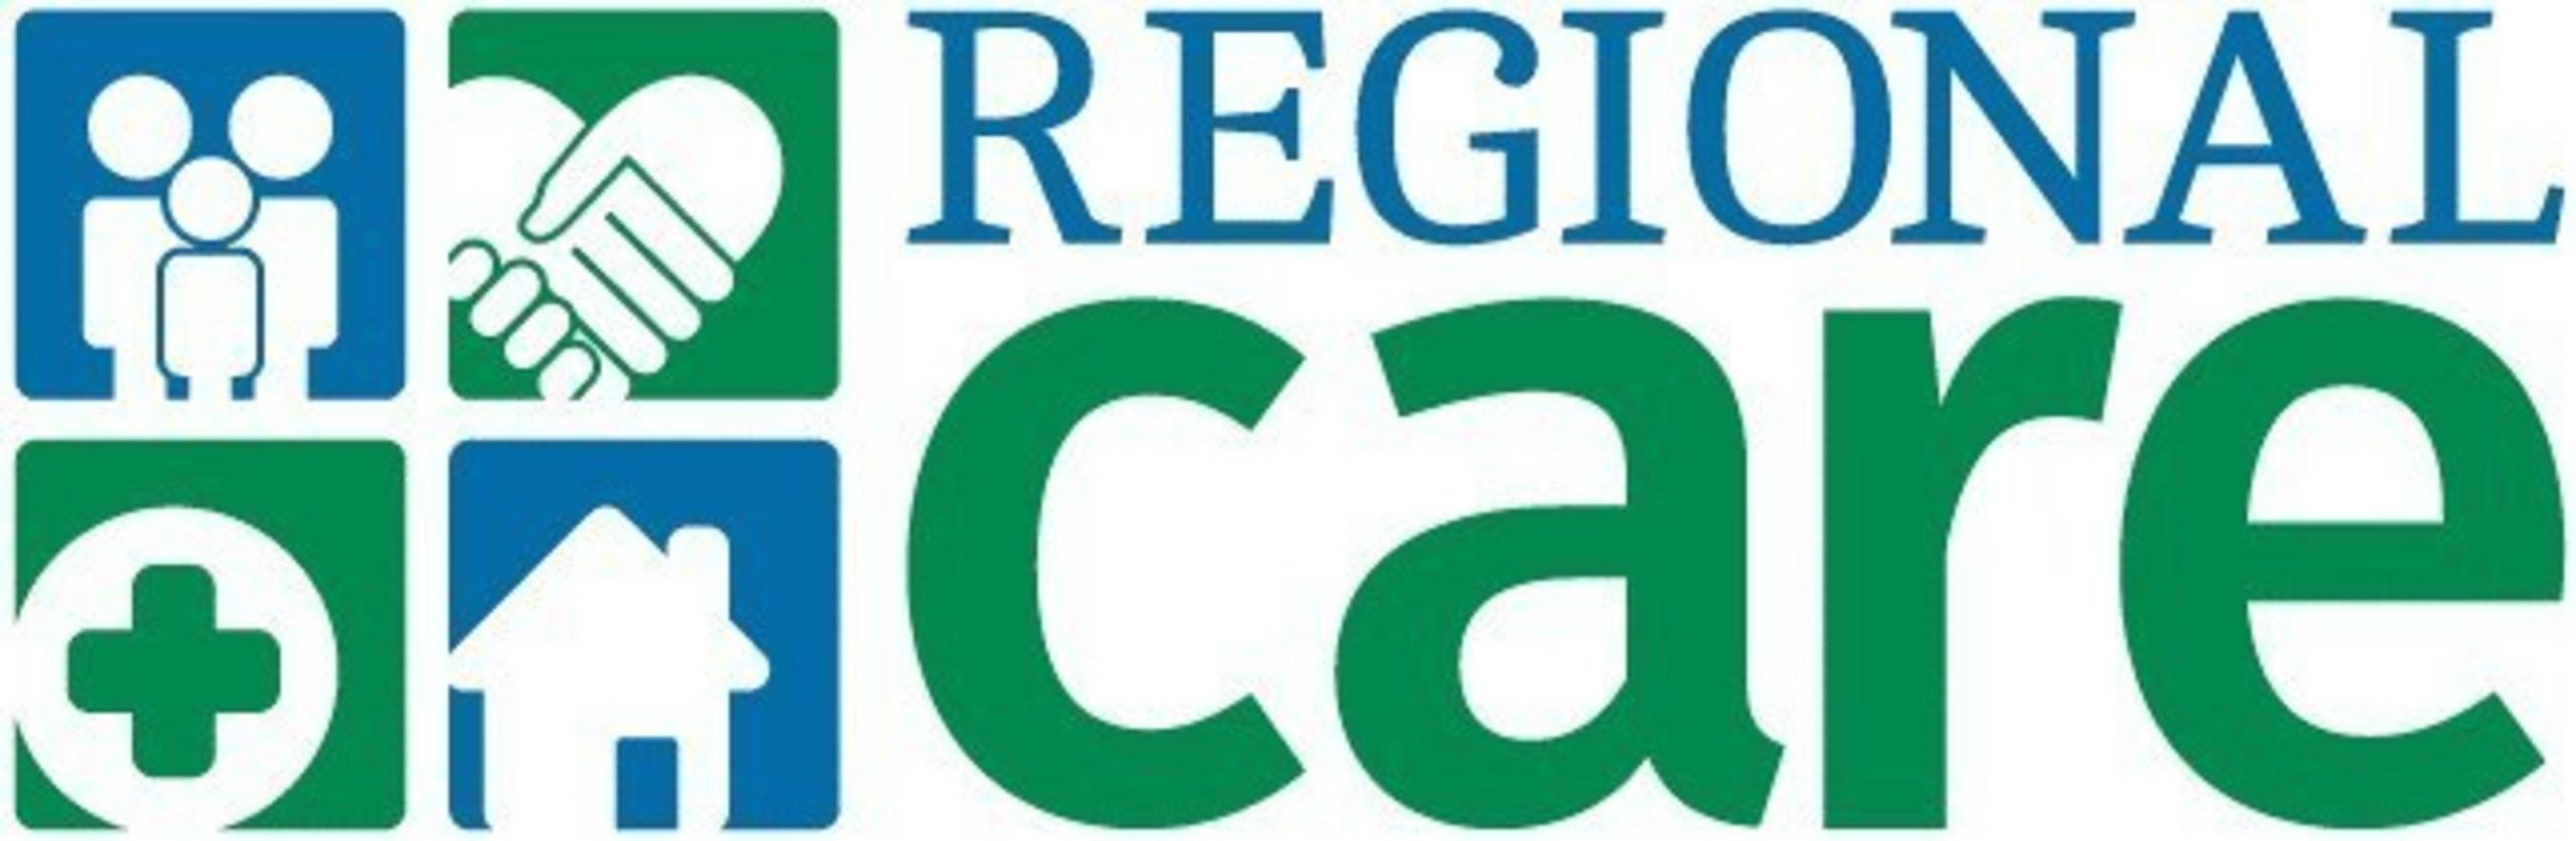 RegionalCare Hospital Partners Inc.